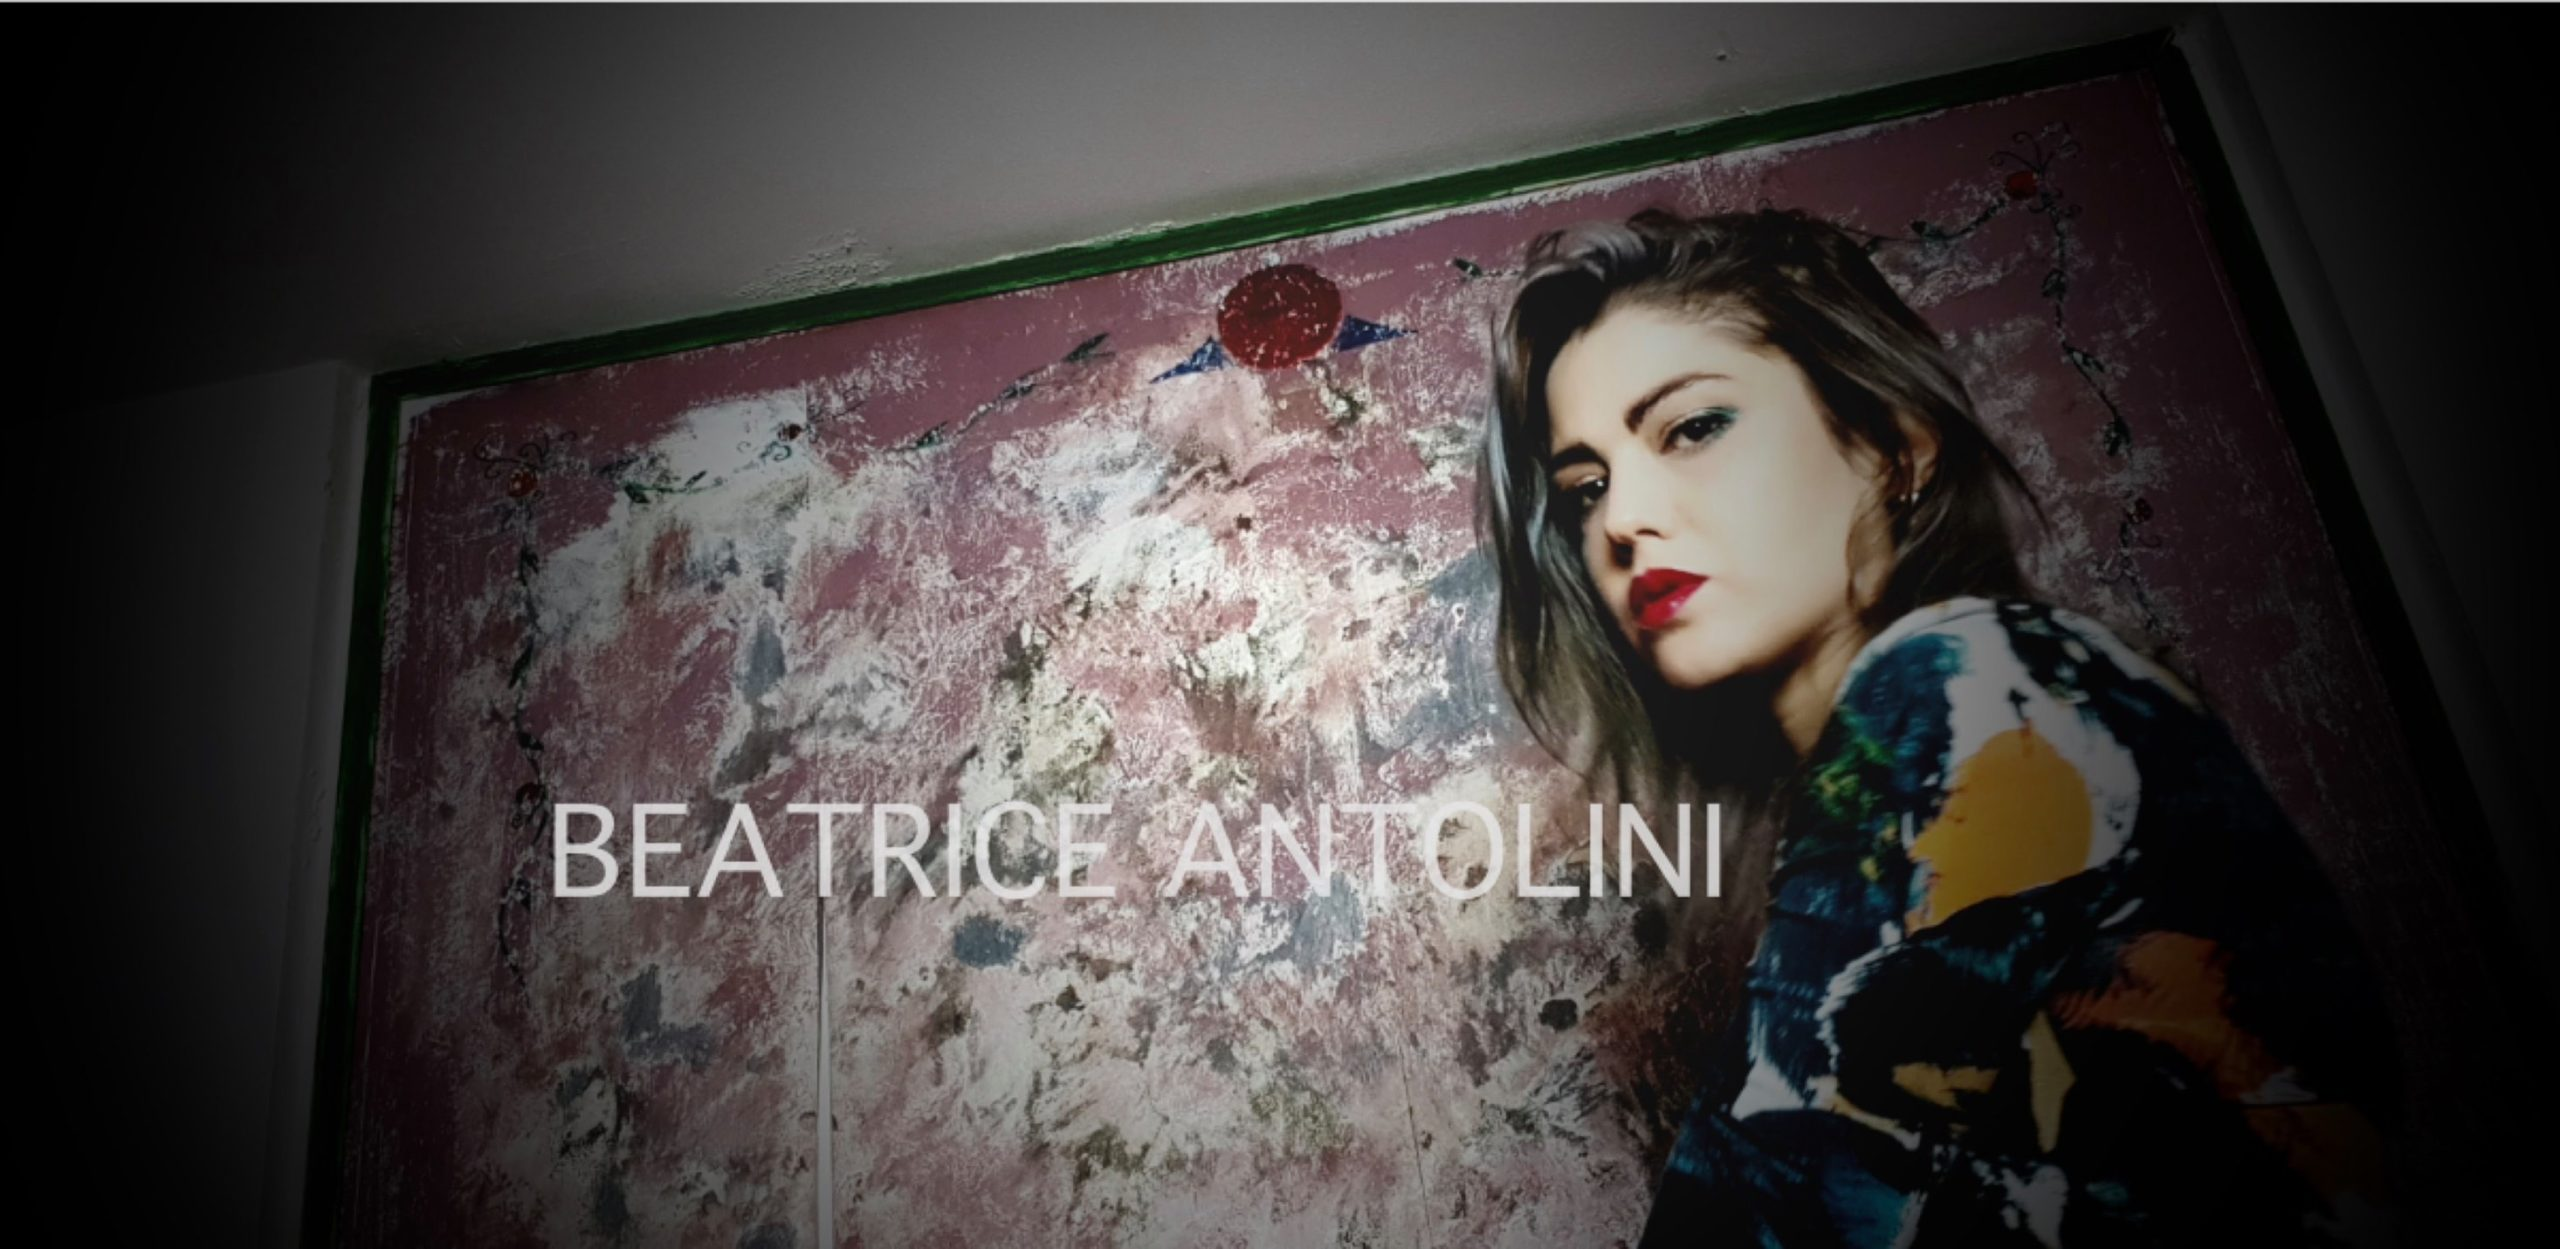 Beatrice Antolini